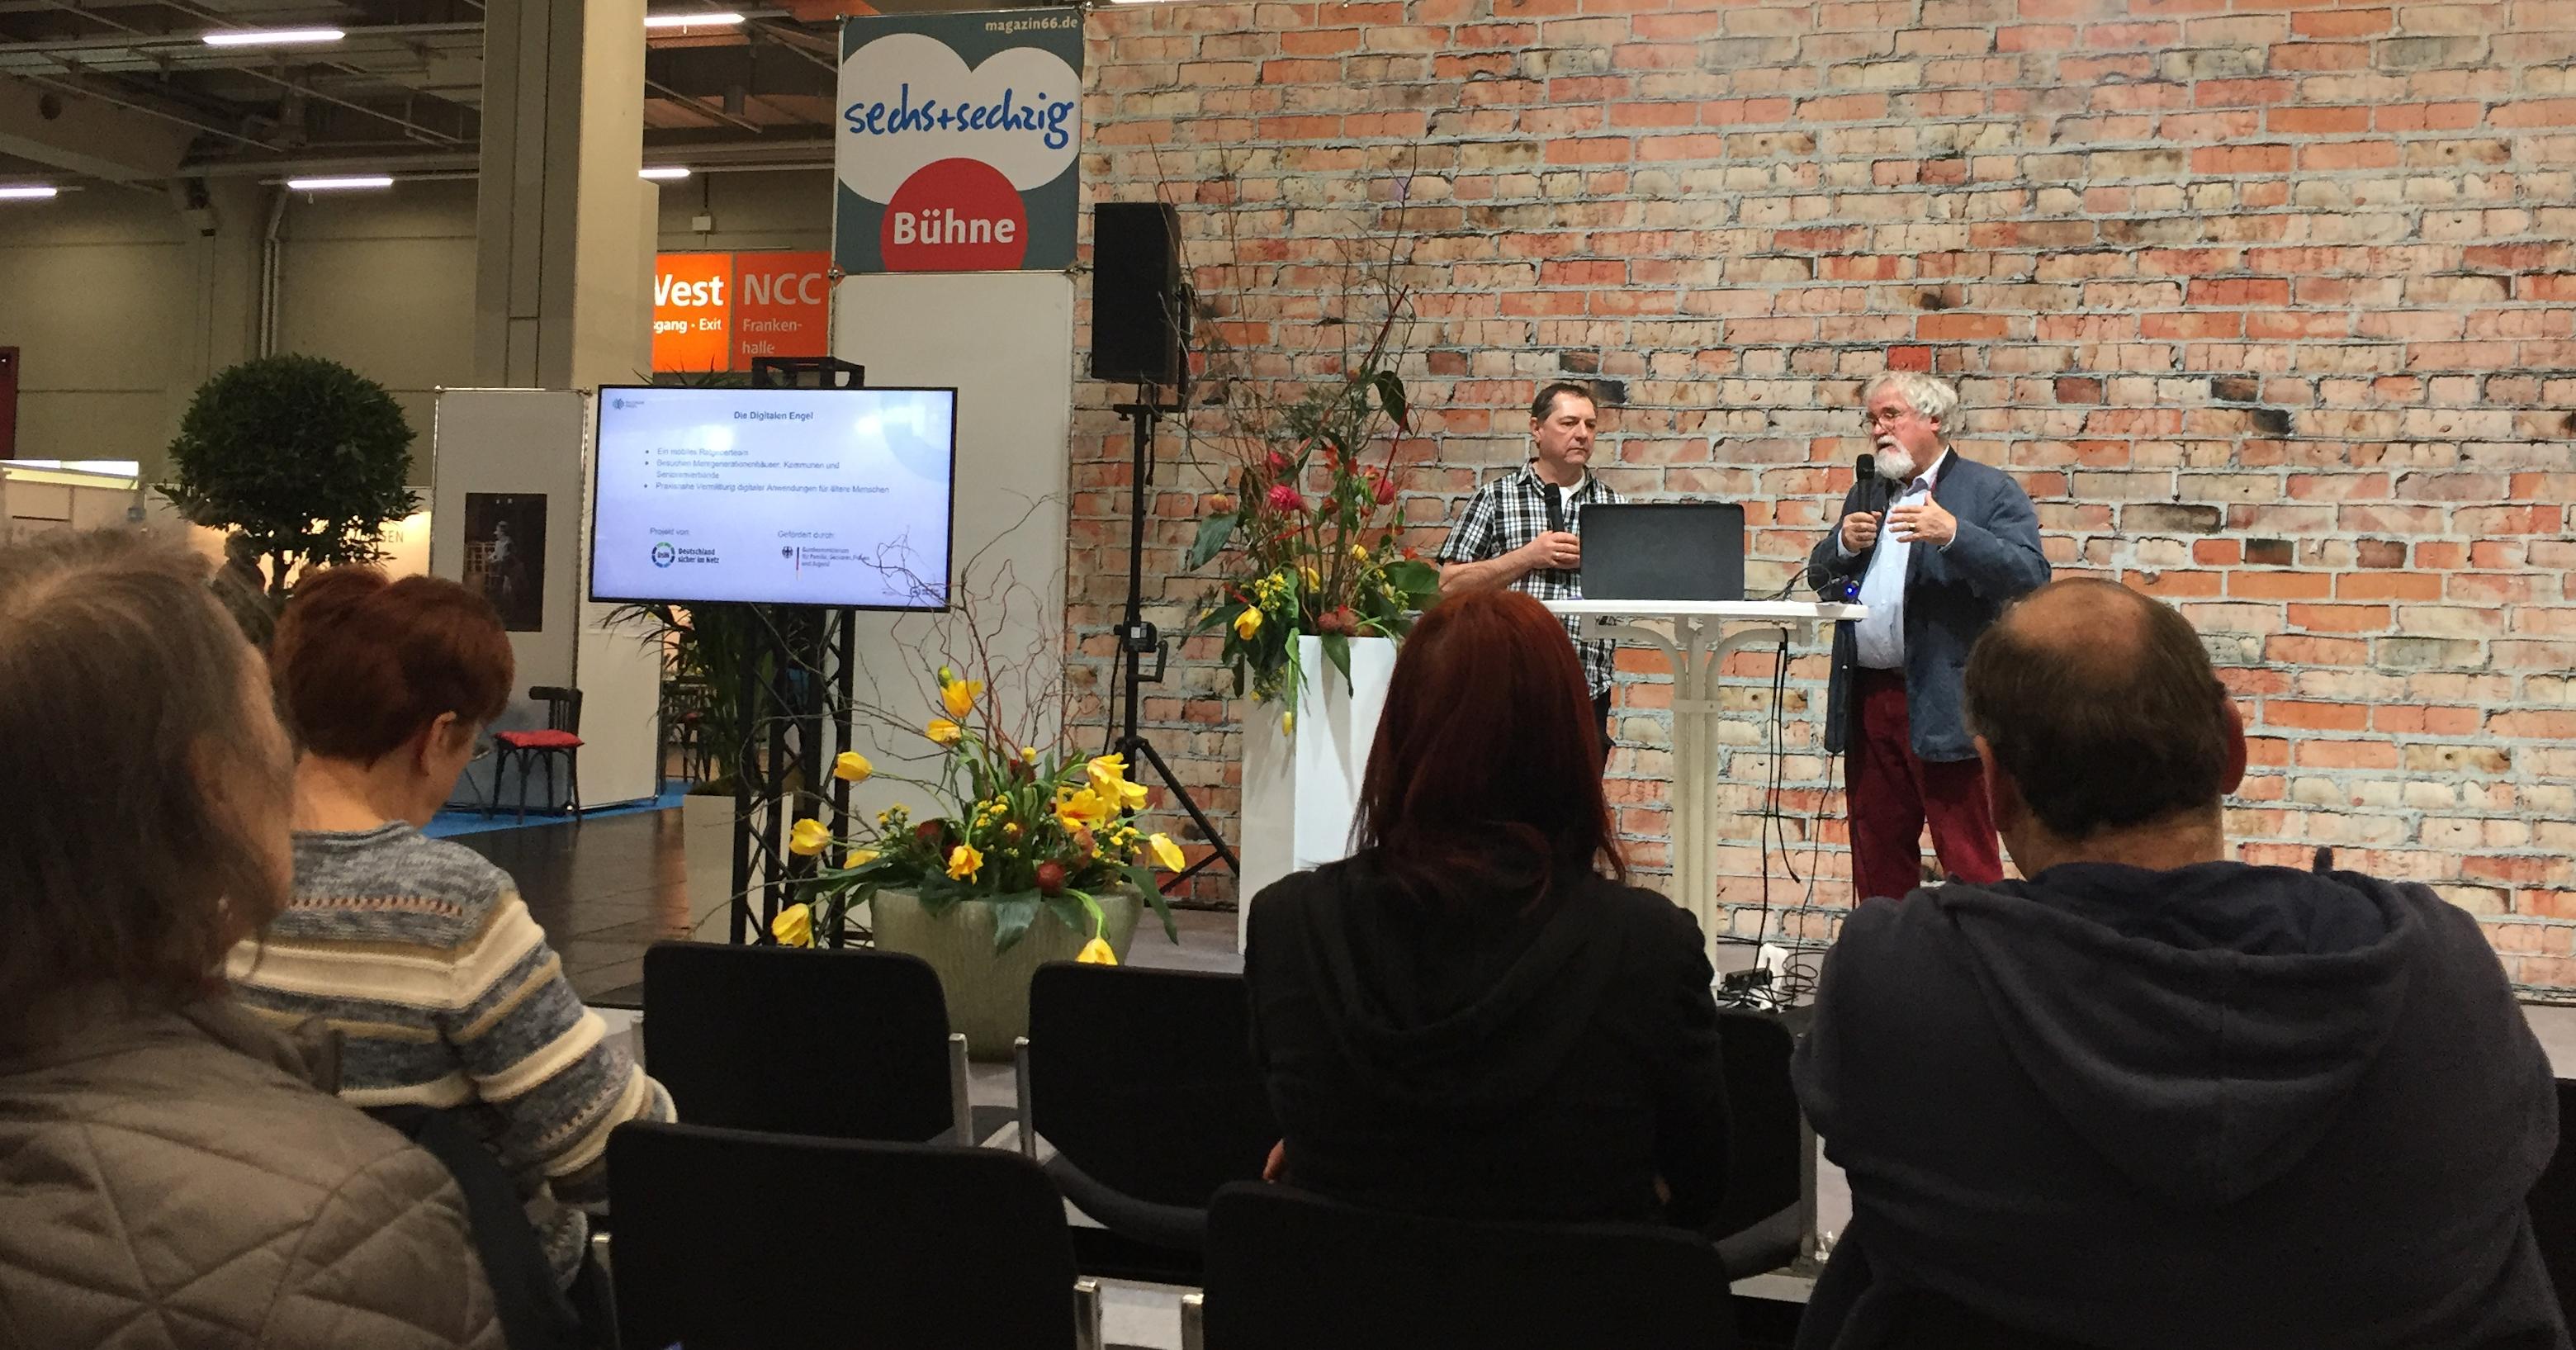 Digitaler Engel Jürgen Schuh auf der Inviva Messe Nürnberg 2020